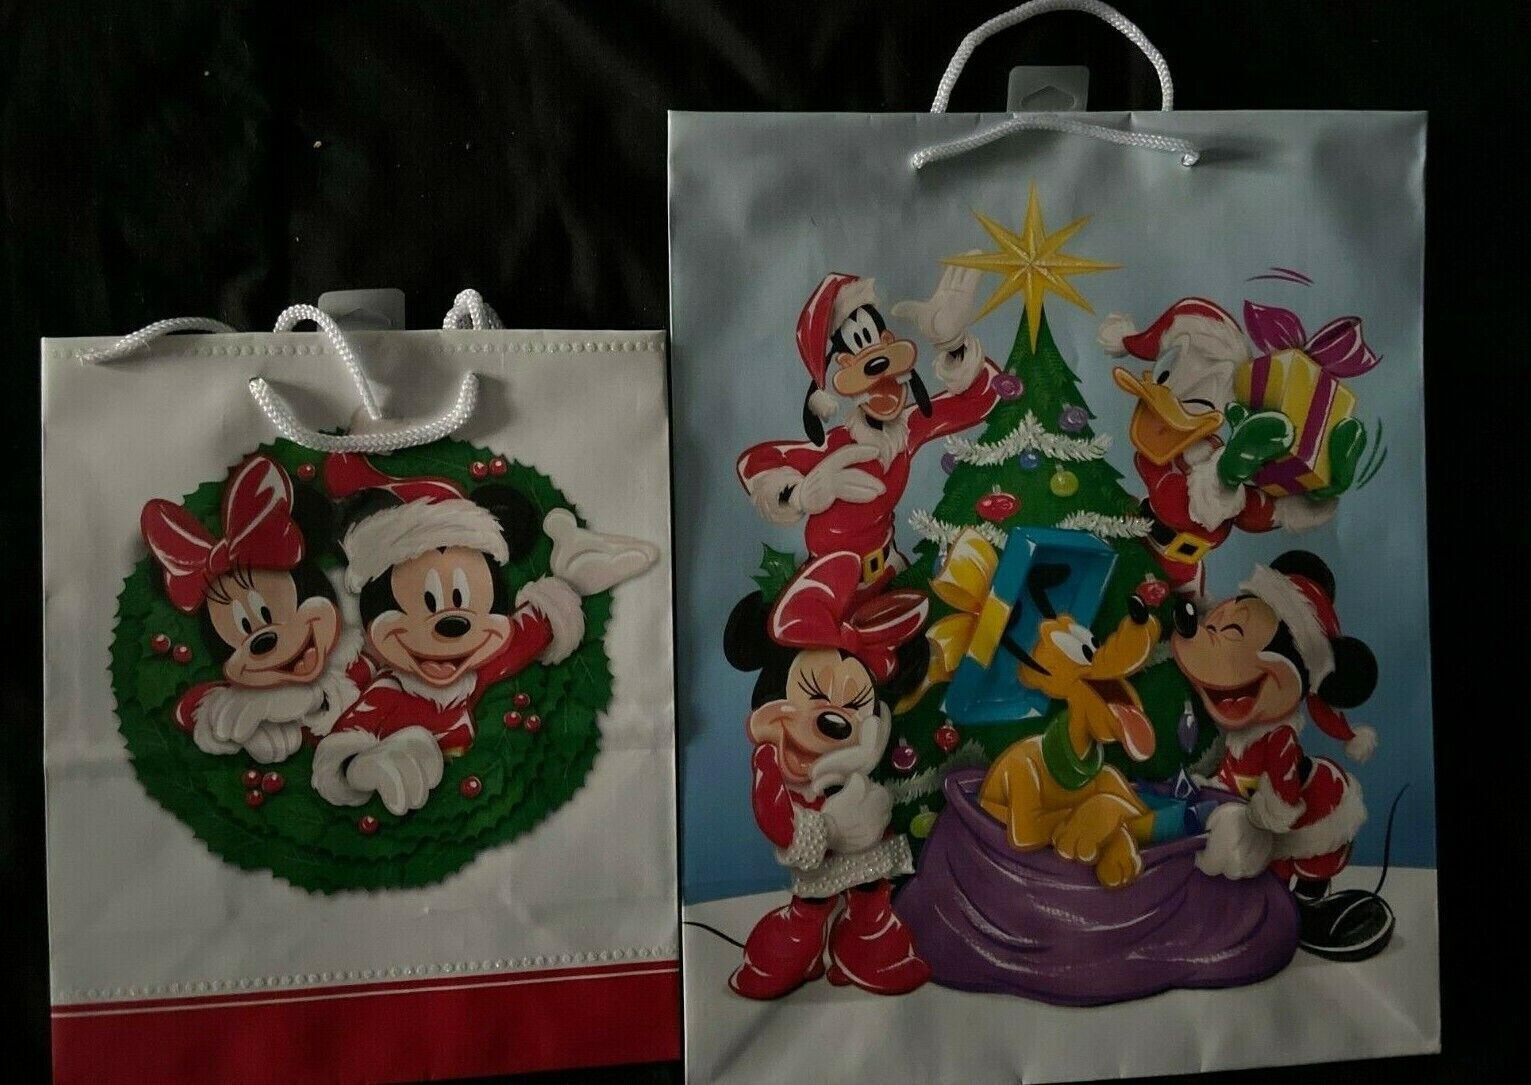 Disney Mickey & Minnie Mouse Christmas Hallmark Paper Gift B